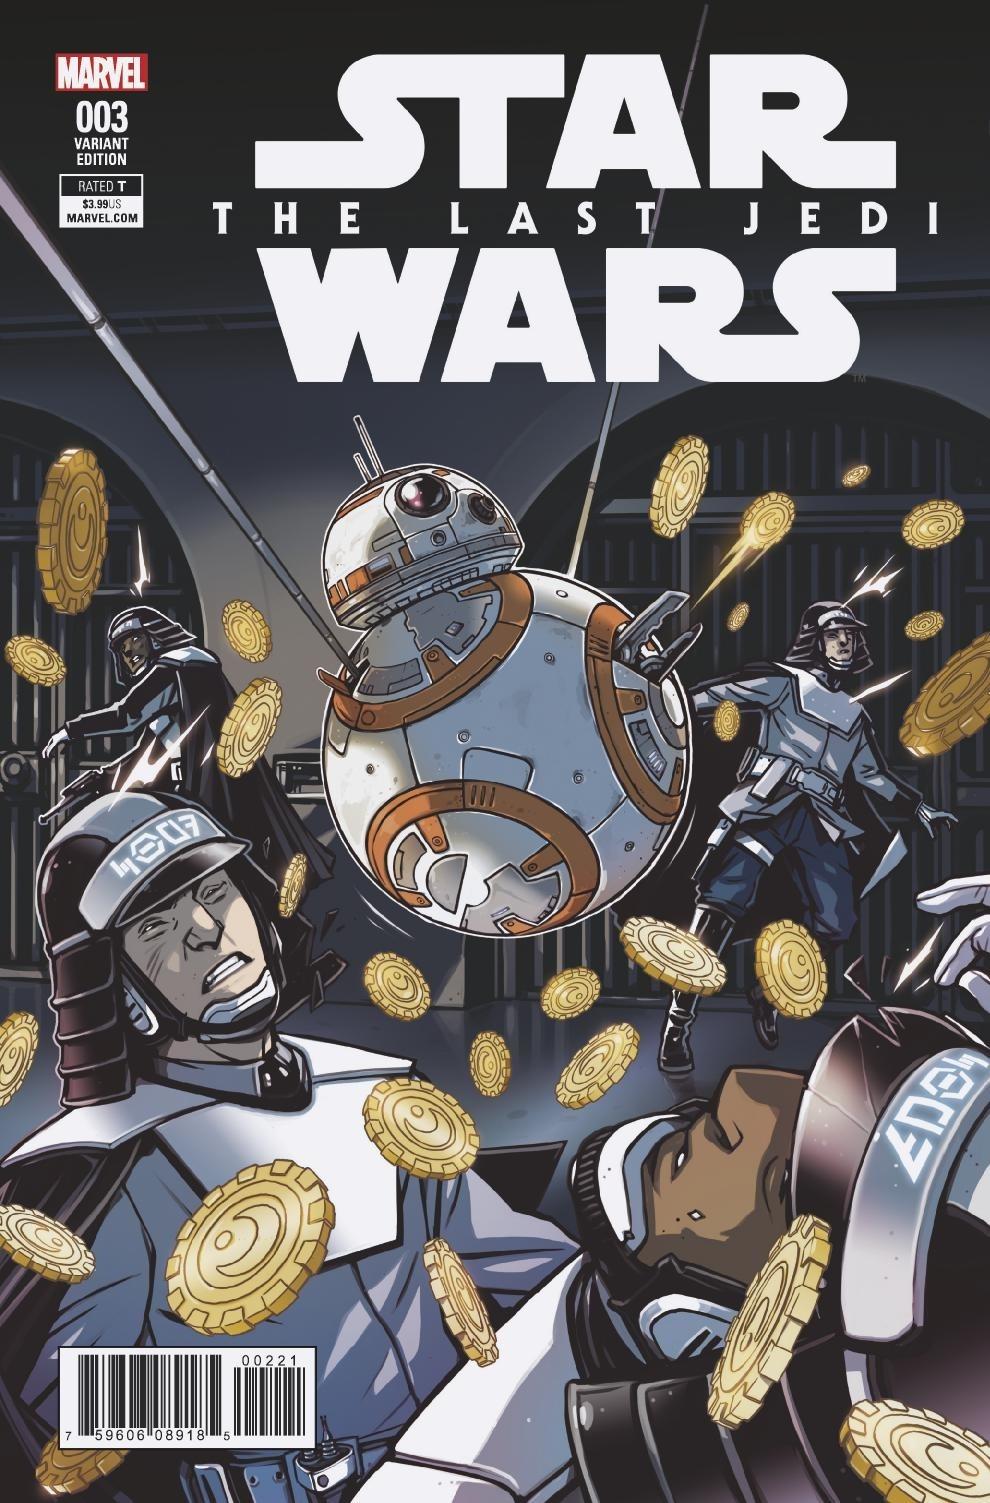 Star Wars: The Last Jedi #3 (Caspar Wijngaard Variant Cover) (06.06.2018)